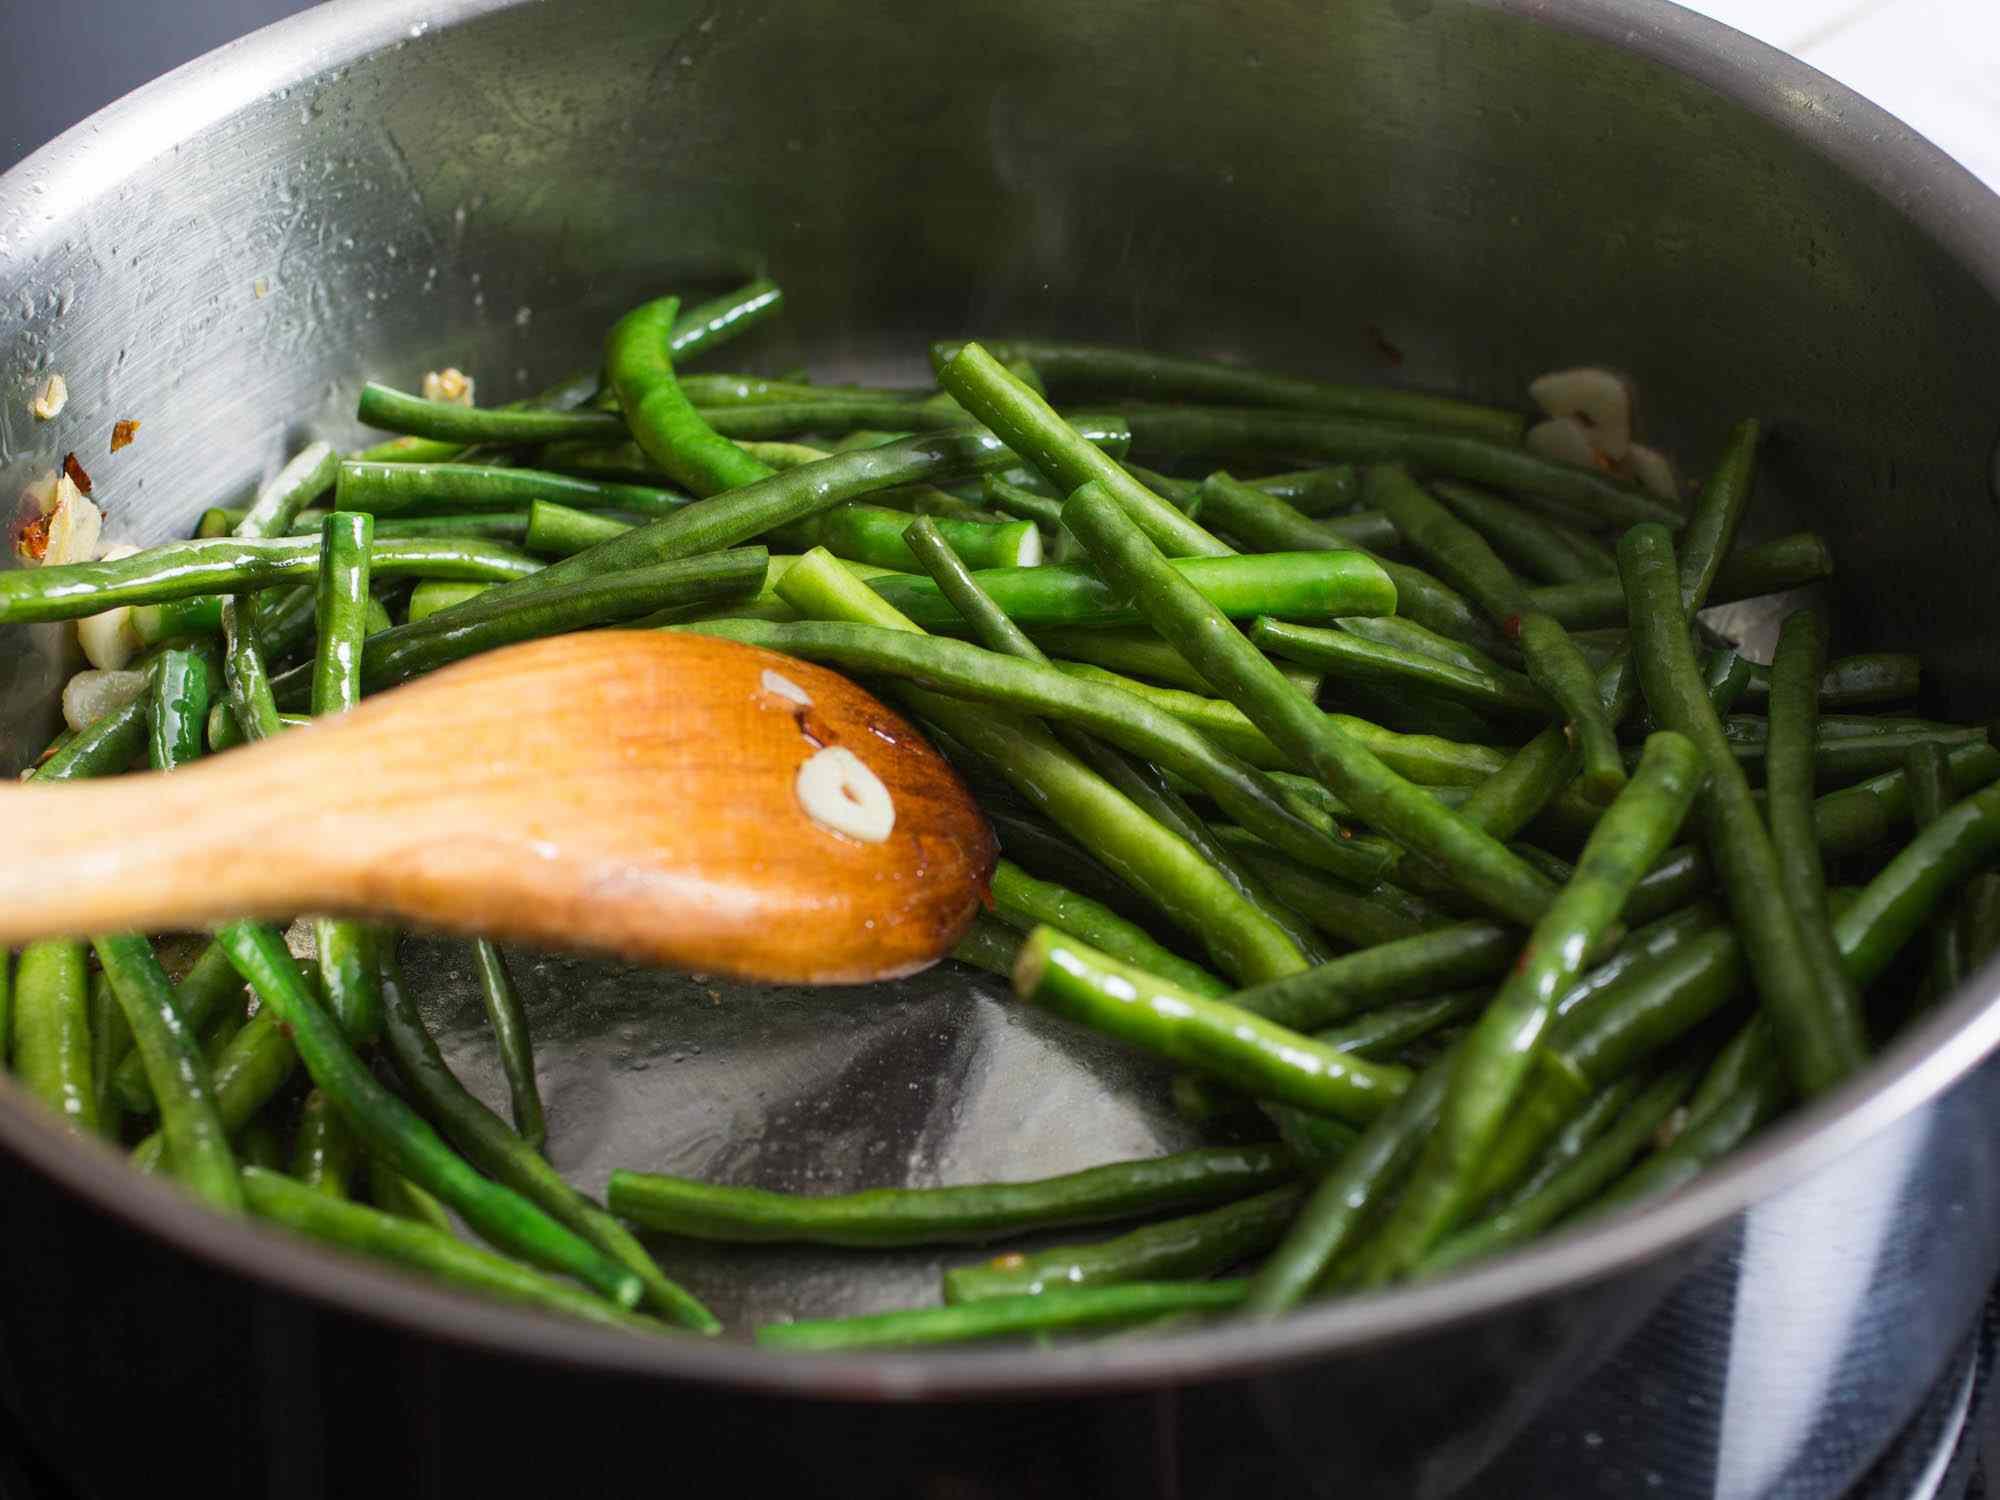 20150715-braised-long-beans-vicky-wasik-3.jpg